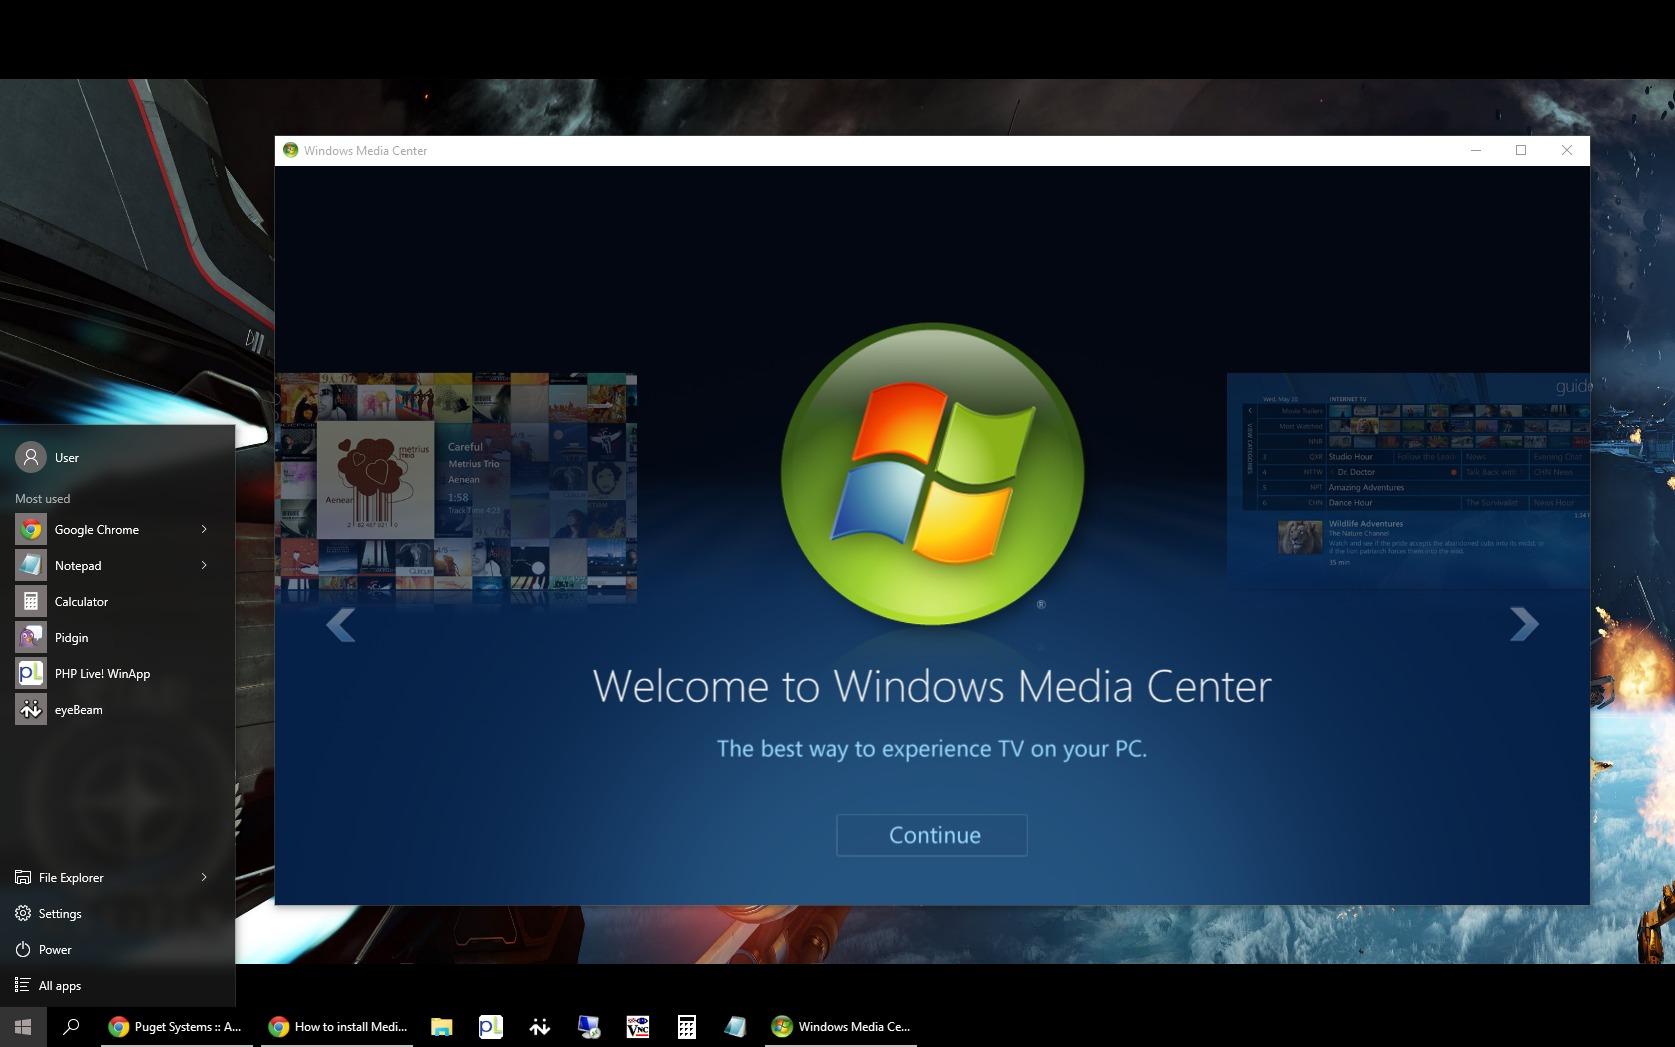 Windows Media Center running on Windows 10